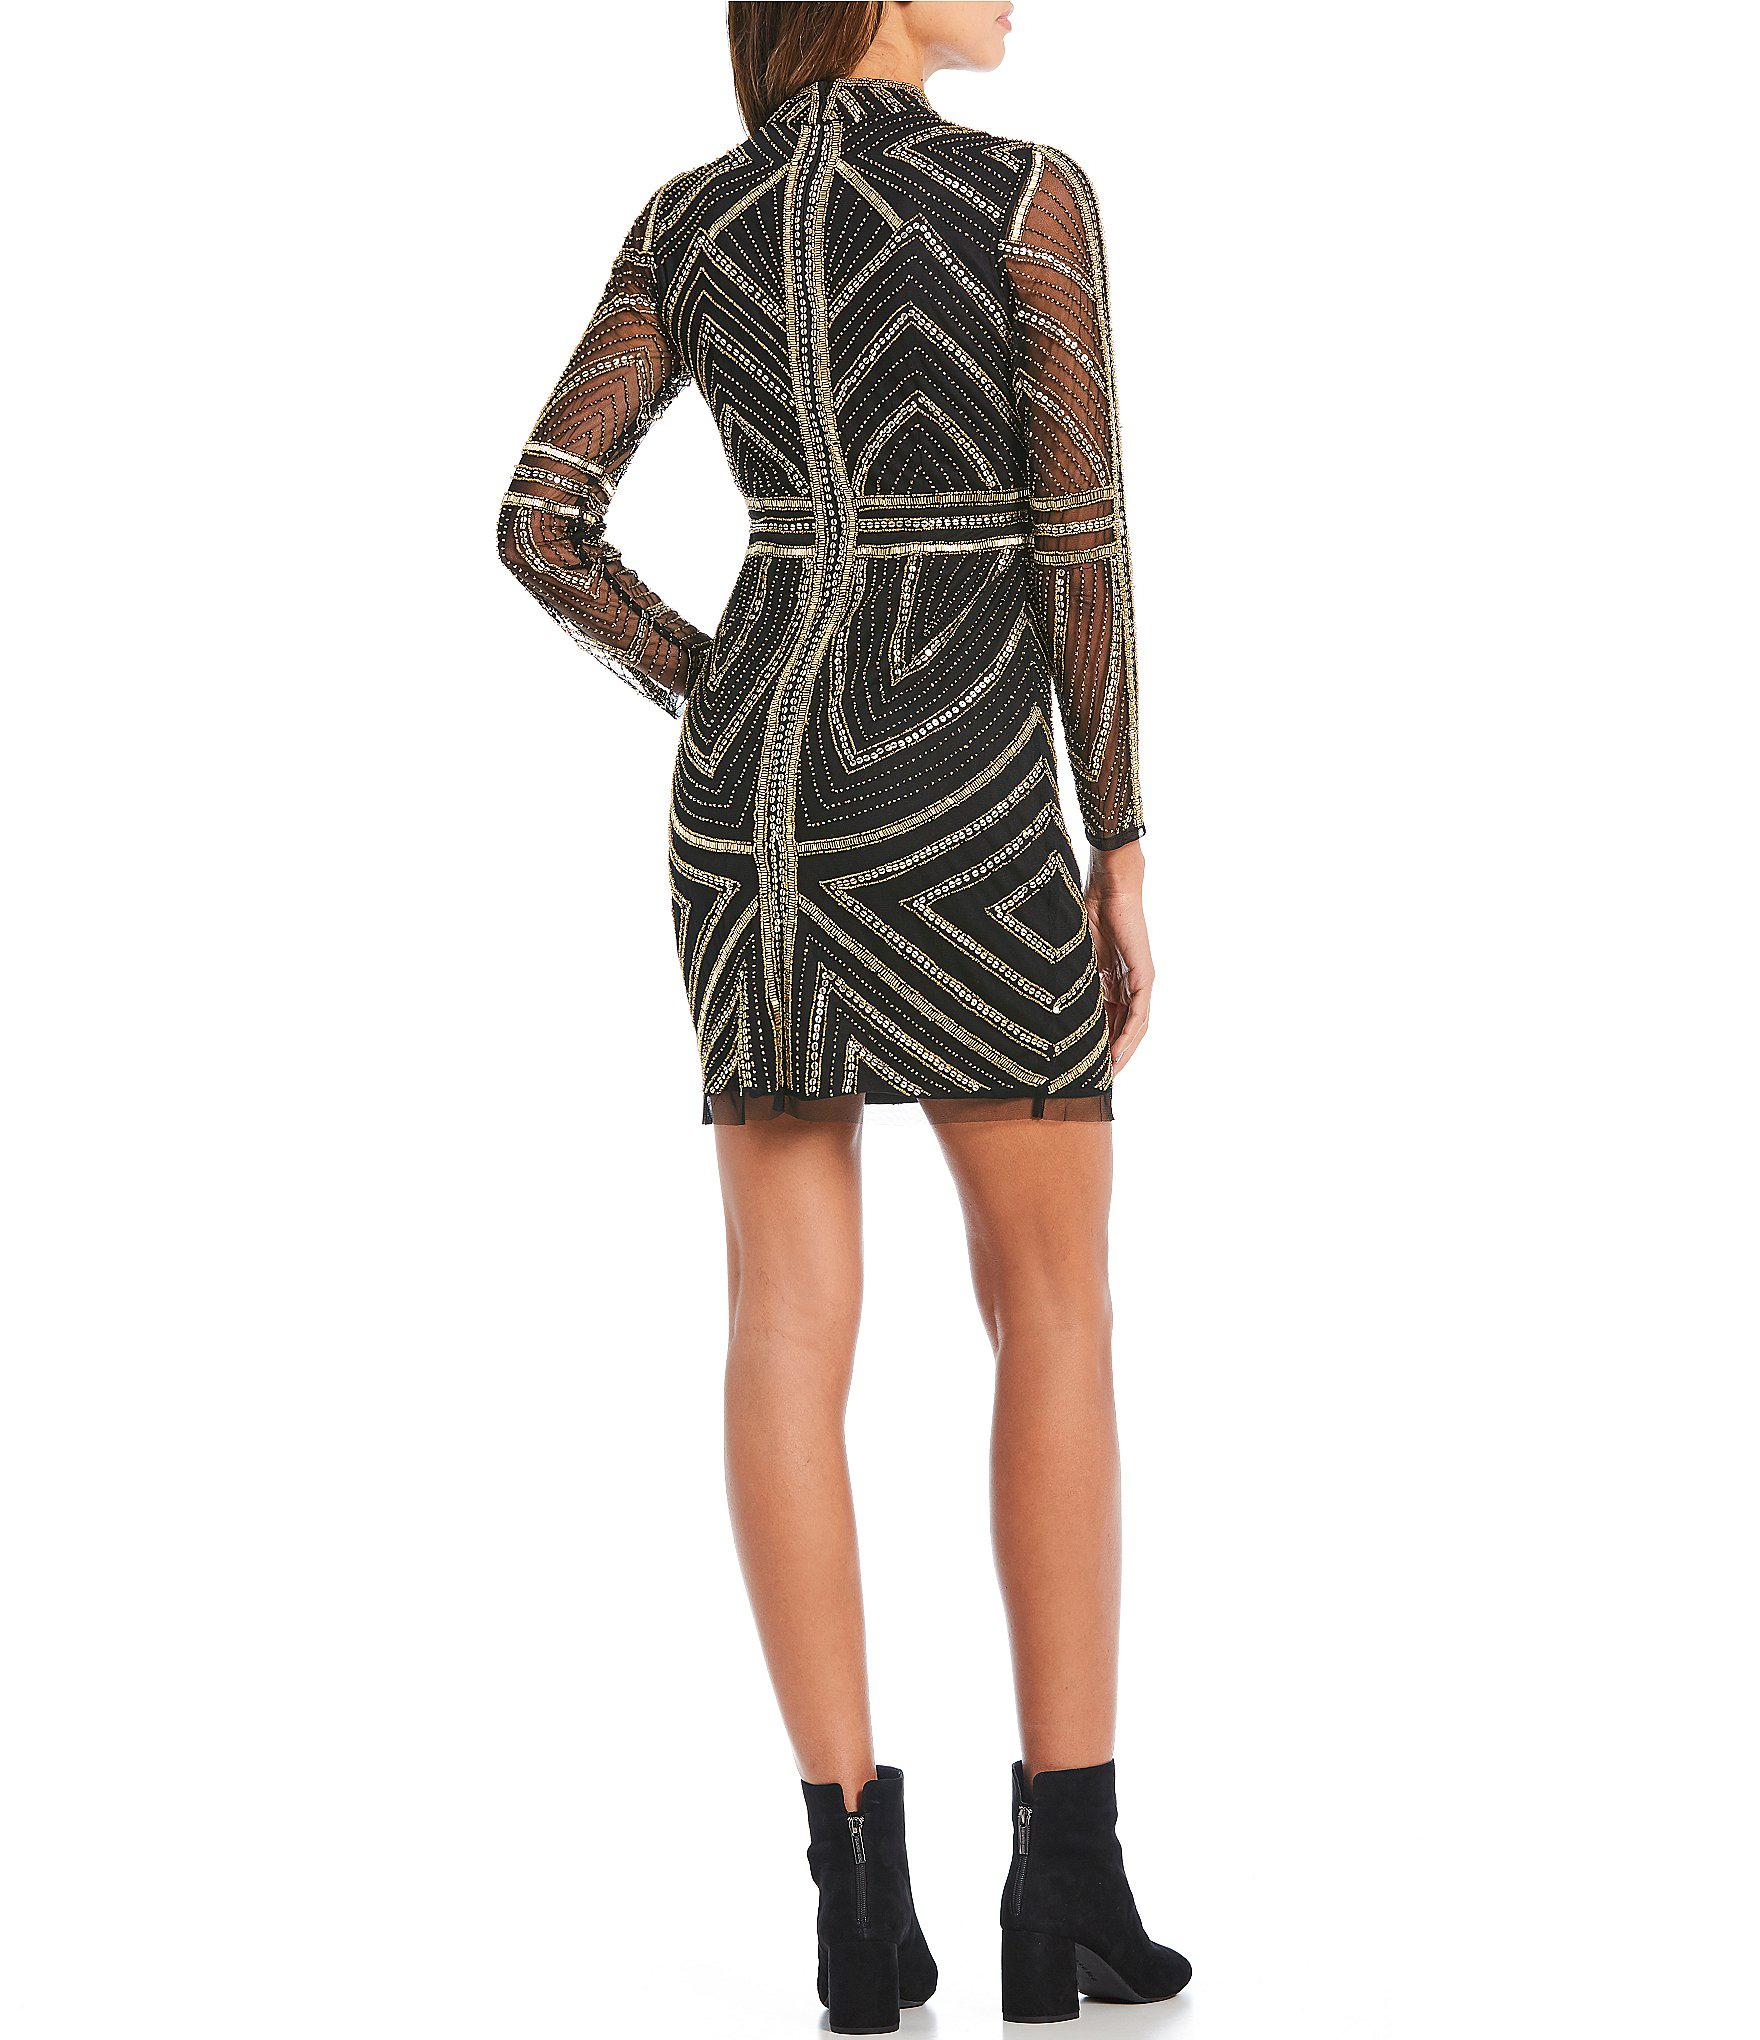 adaef55b880 Gianni Bini Jess Mockneck Metallic Sequin Embellished Mini Dress in ...